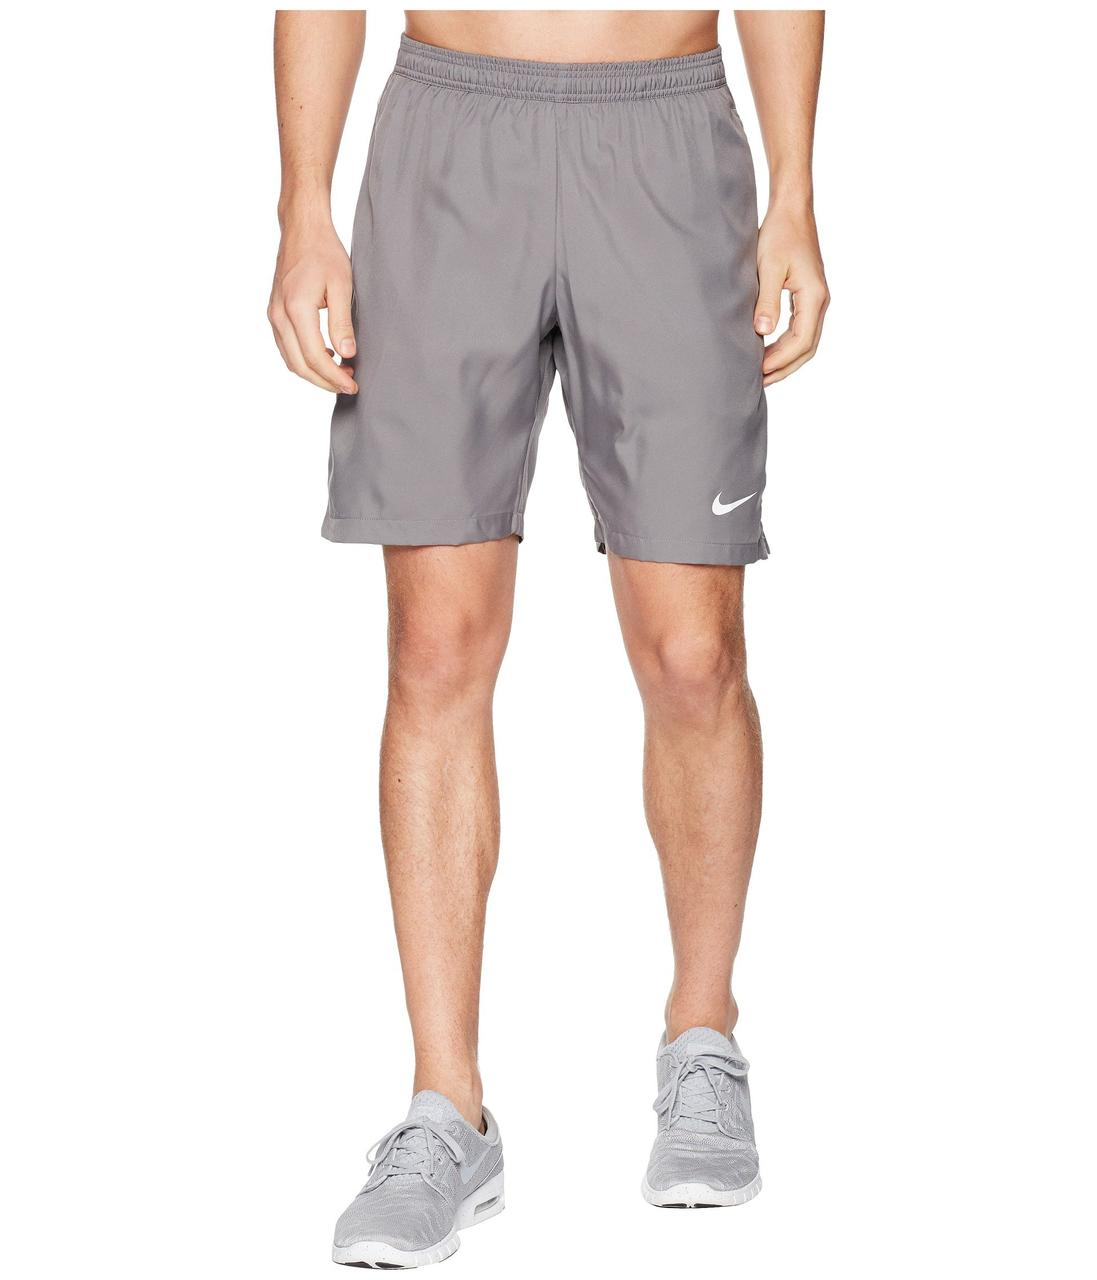 c552bb66 Шорты Nike Court Dry 9 Gray - Оригинал — в Категории